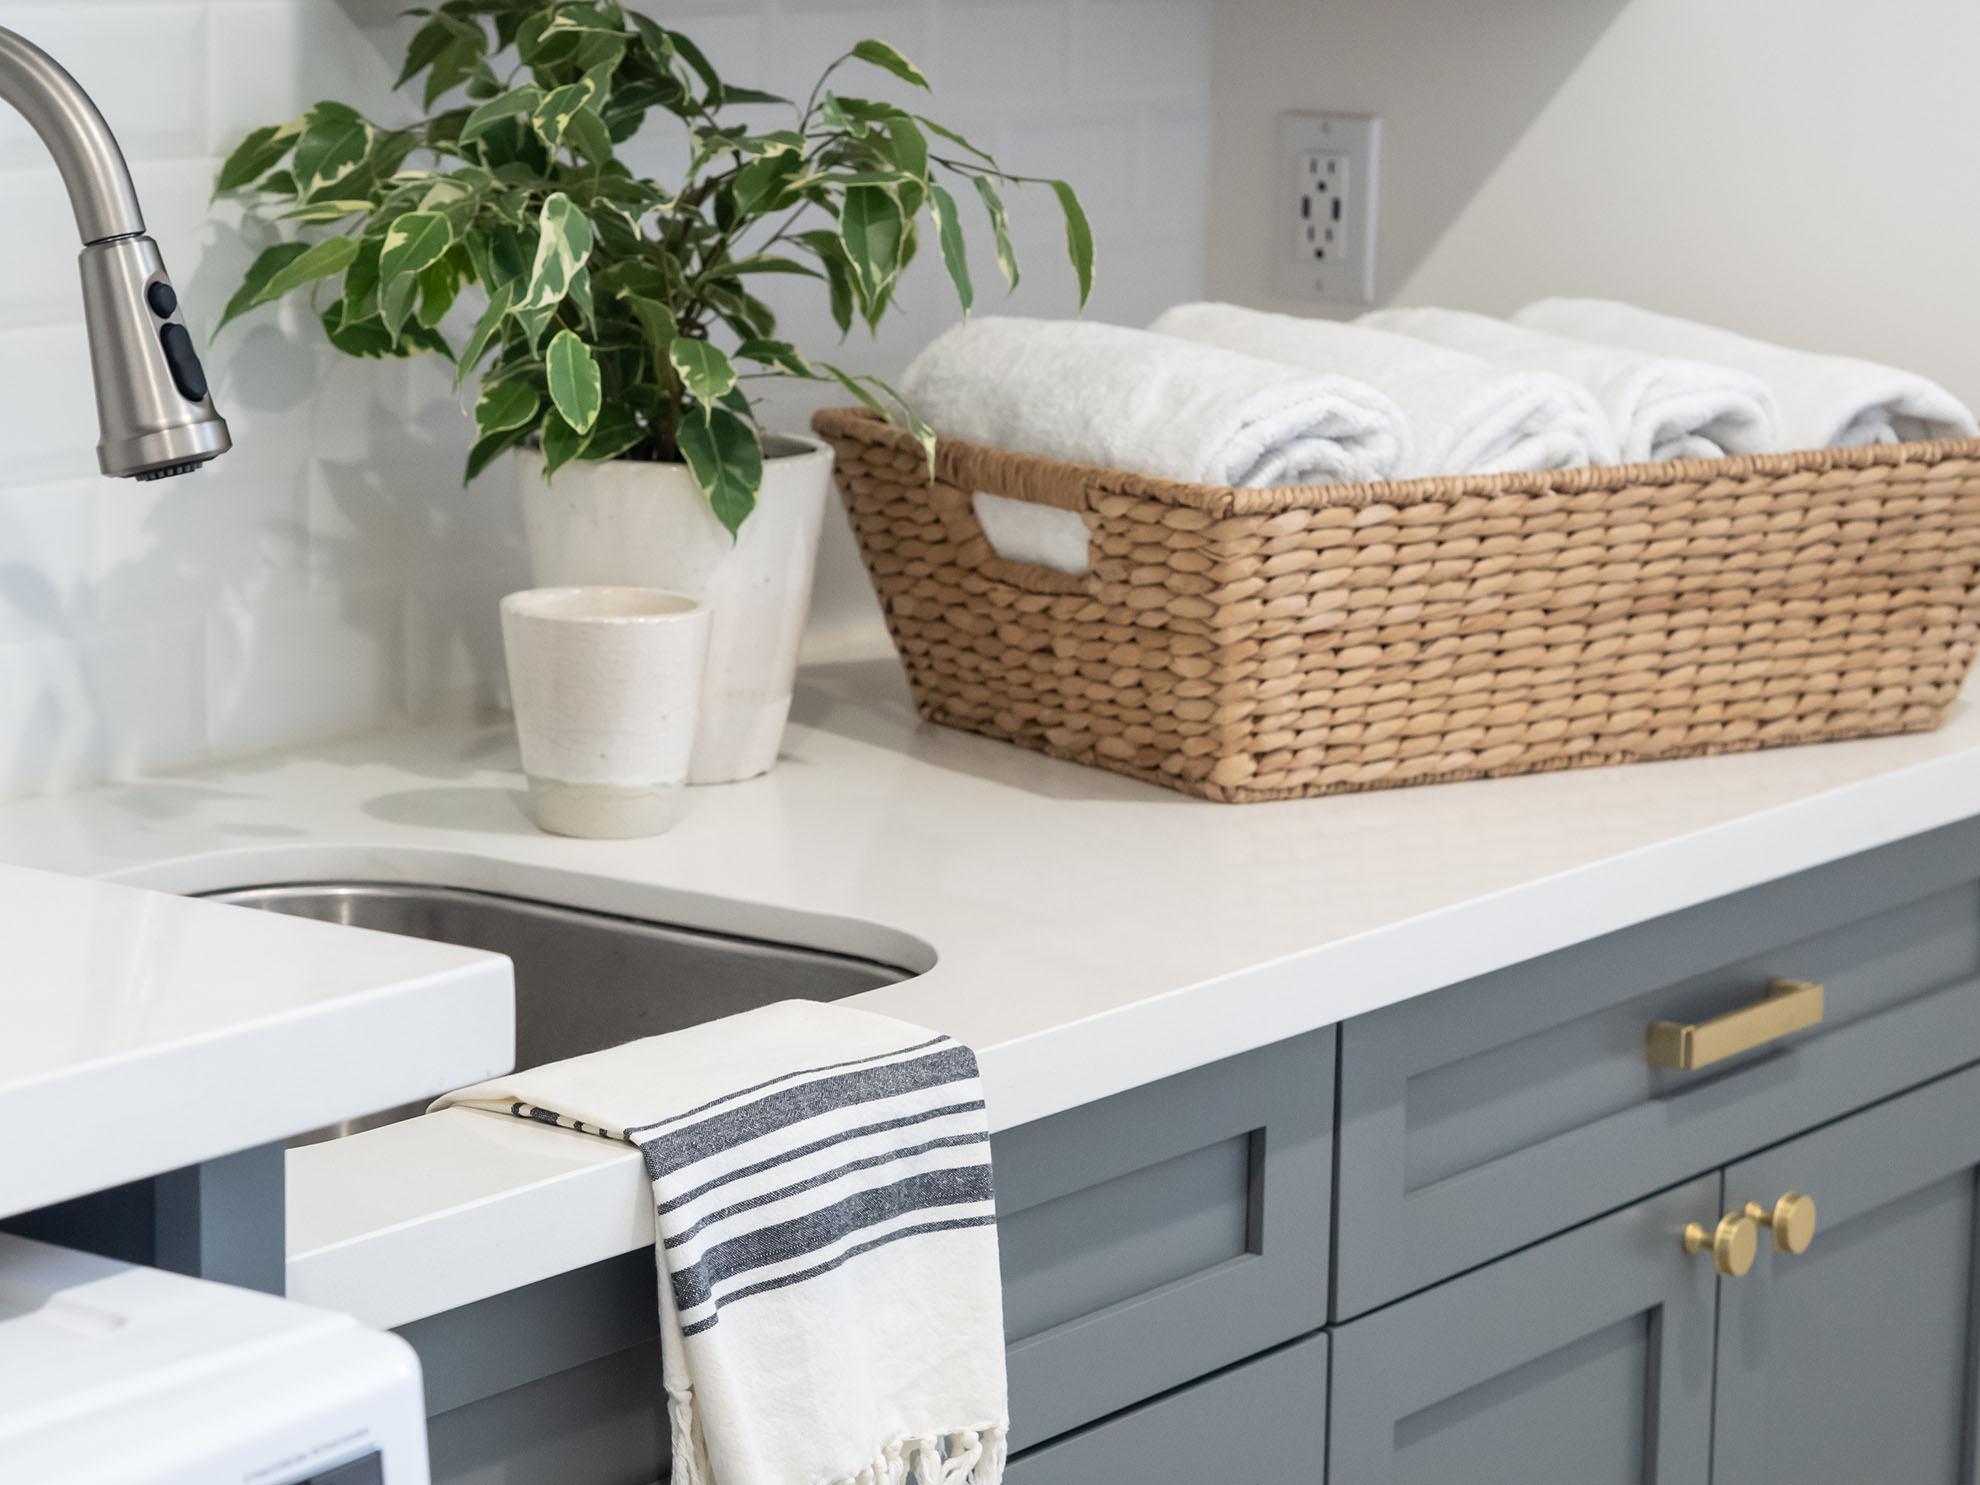 tnd-laundry-1010112.jpg